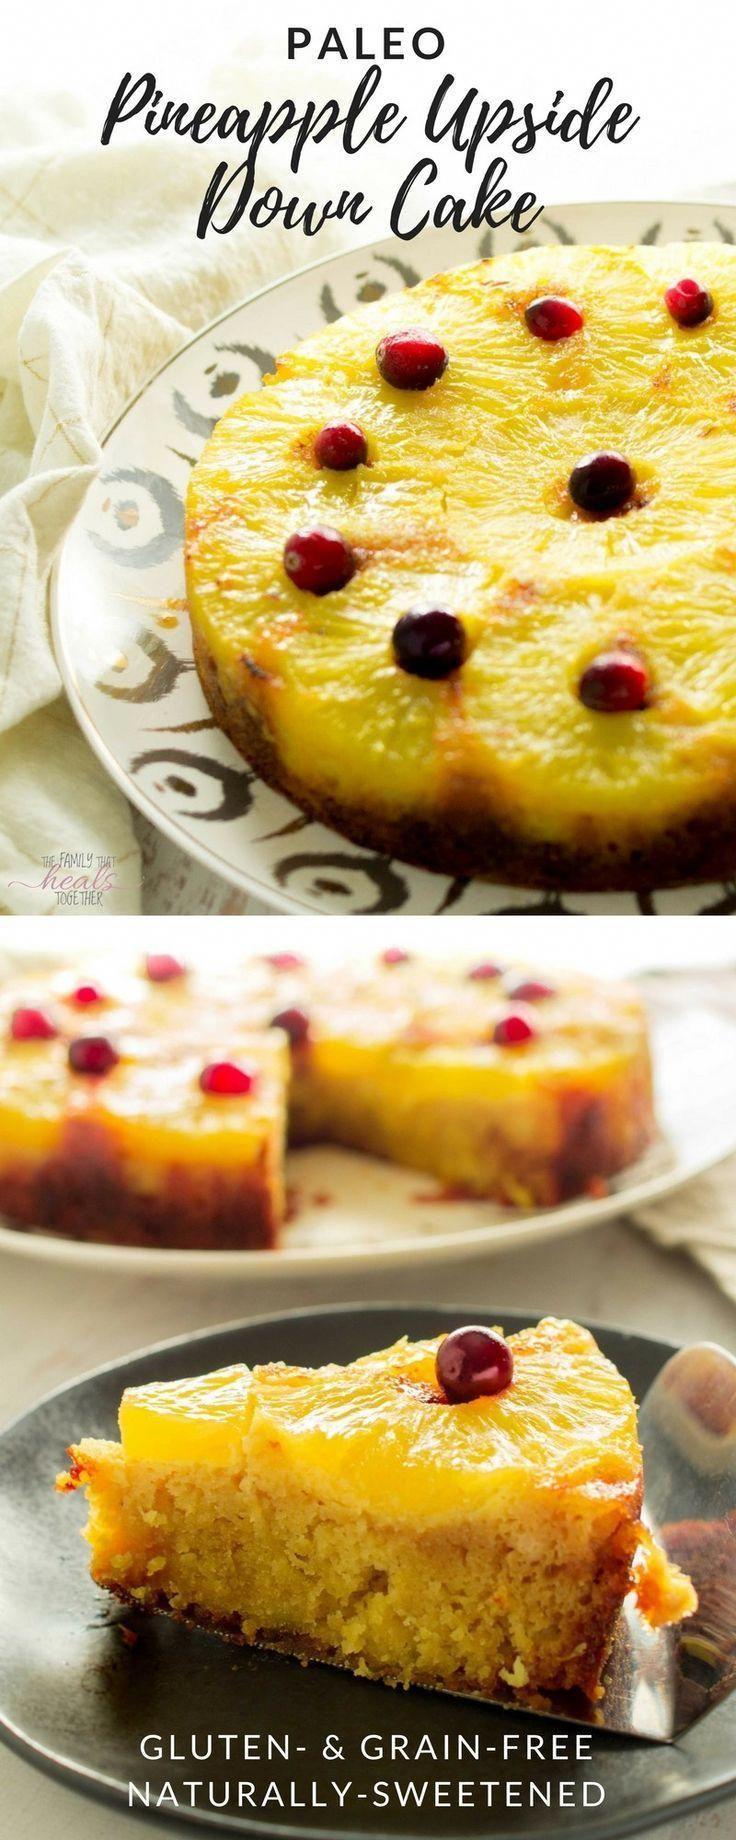 Paleo pineapple upside down cake